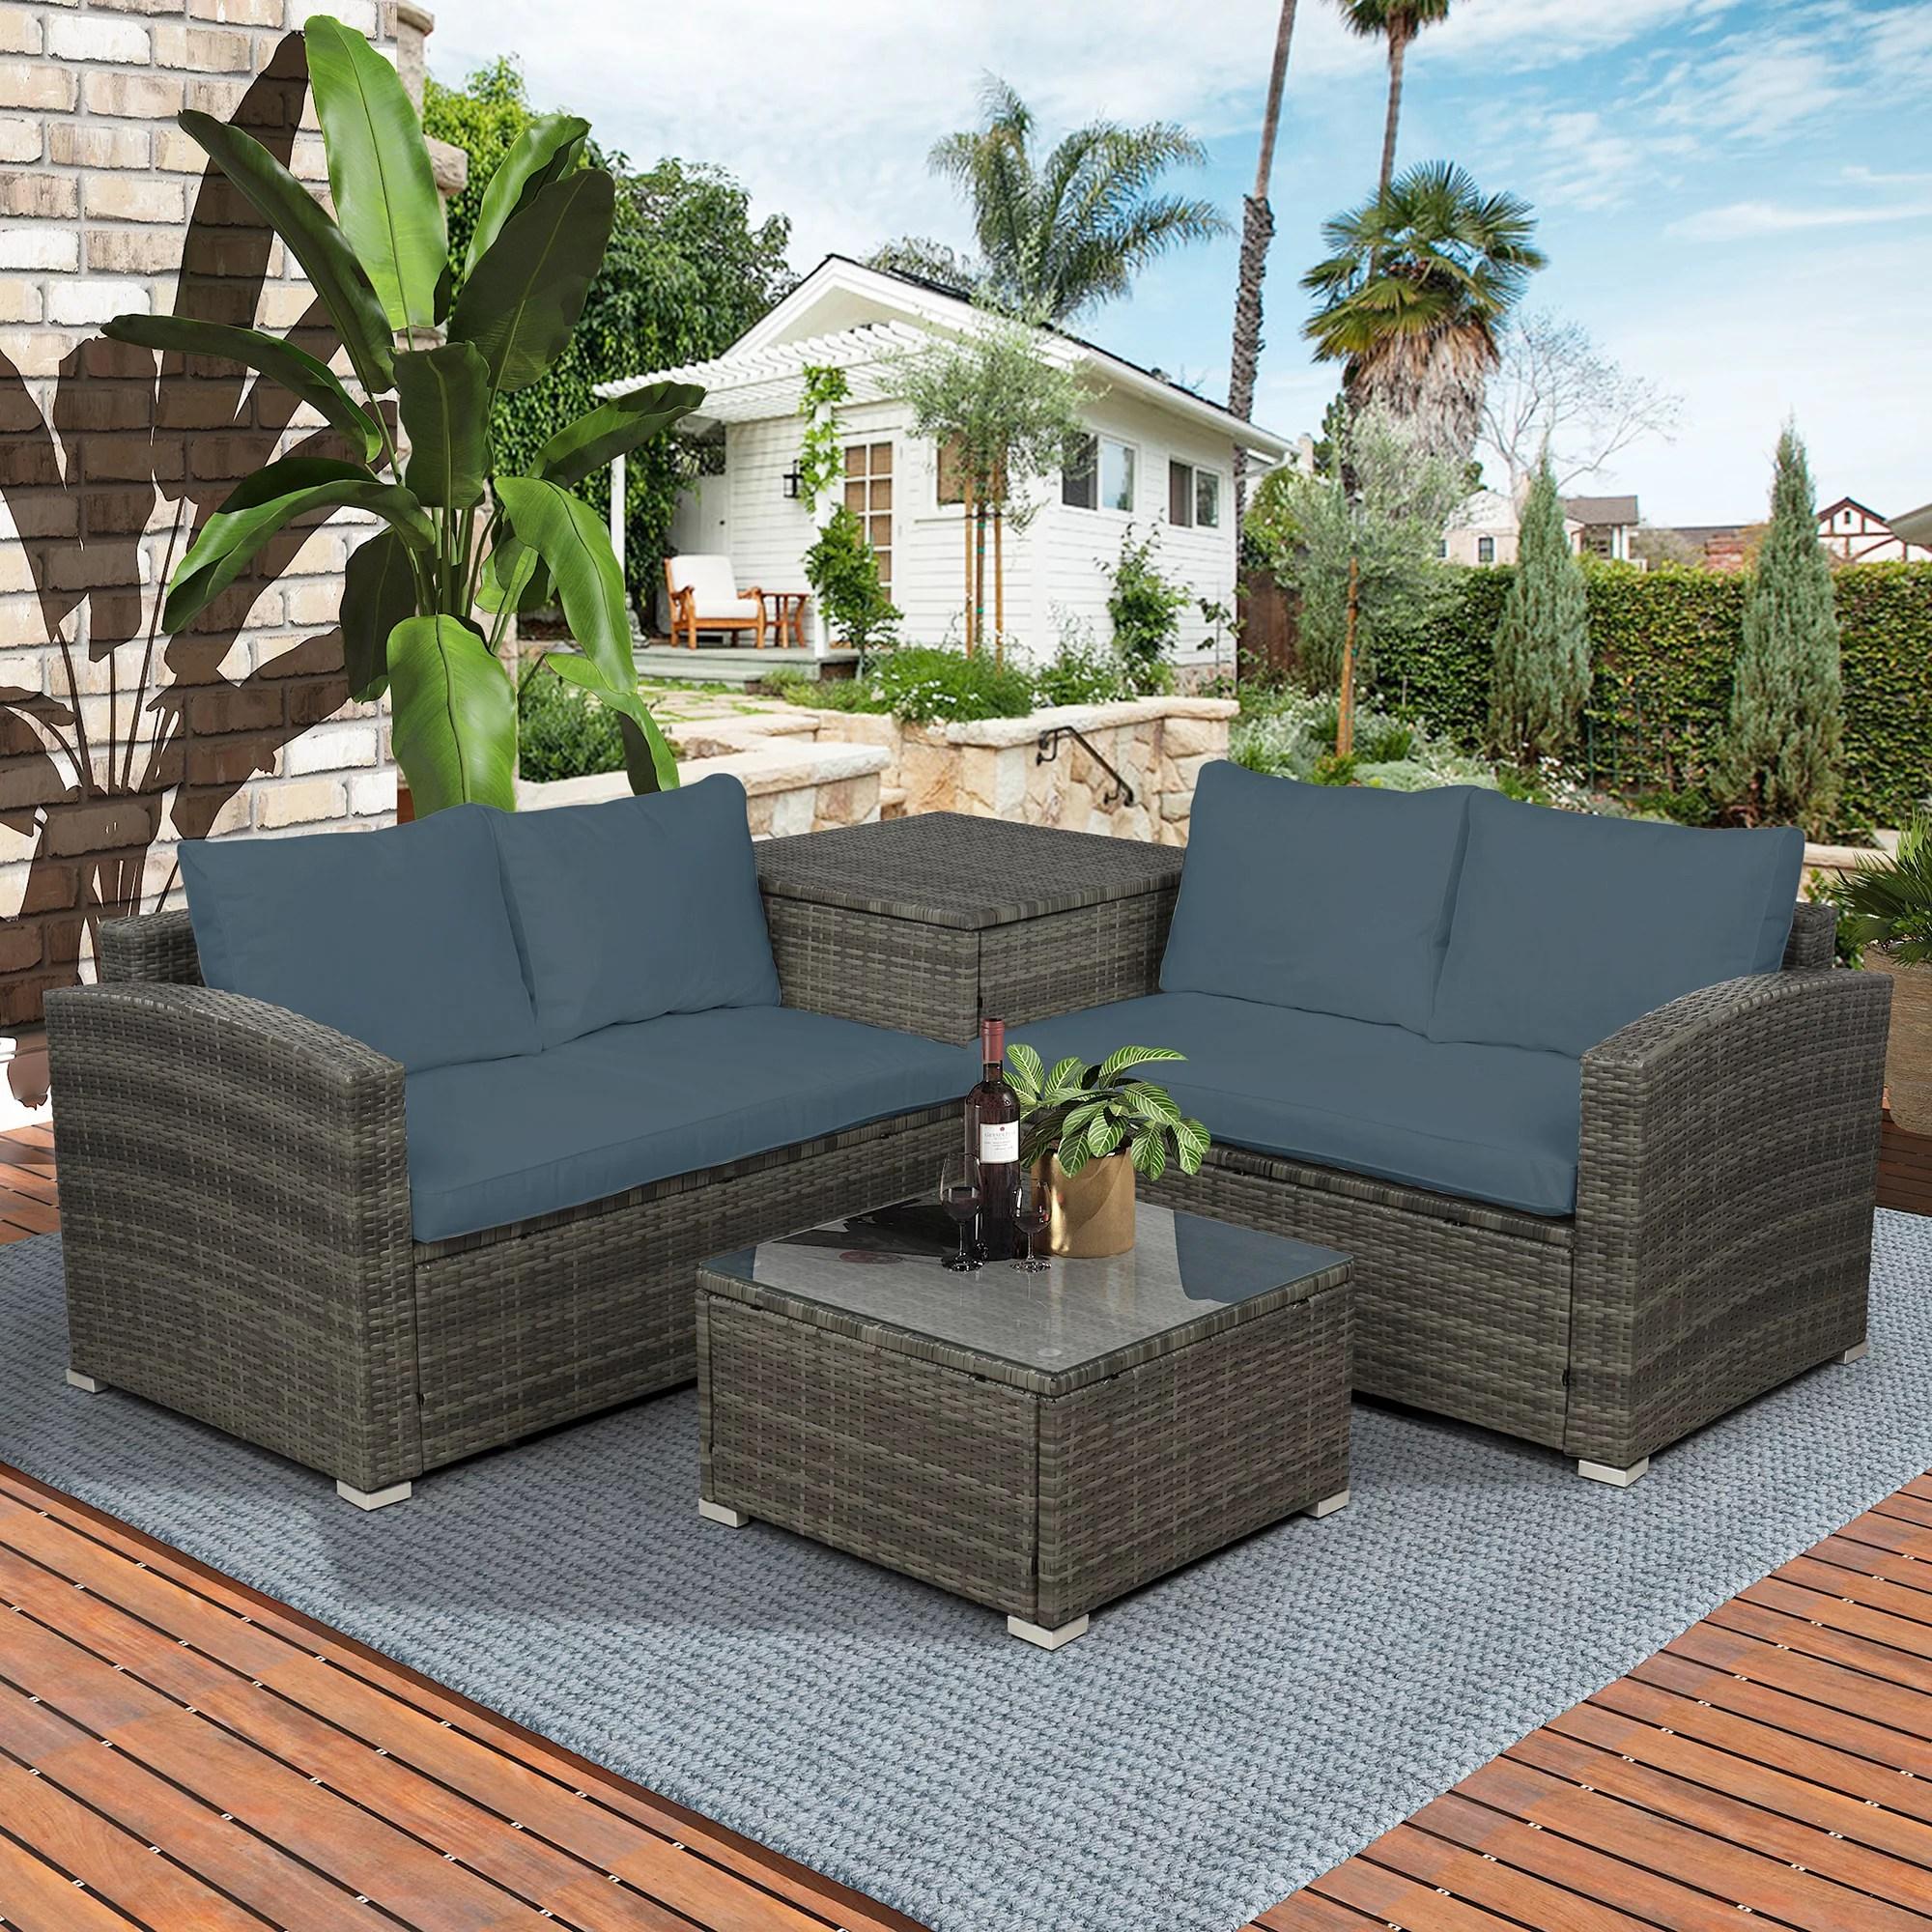 outdoor conversation set btmway 4 piece rattan wicker patio furniture sofa set outdoor deck patio backyard porch lawn bistro chair sets with